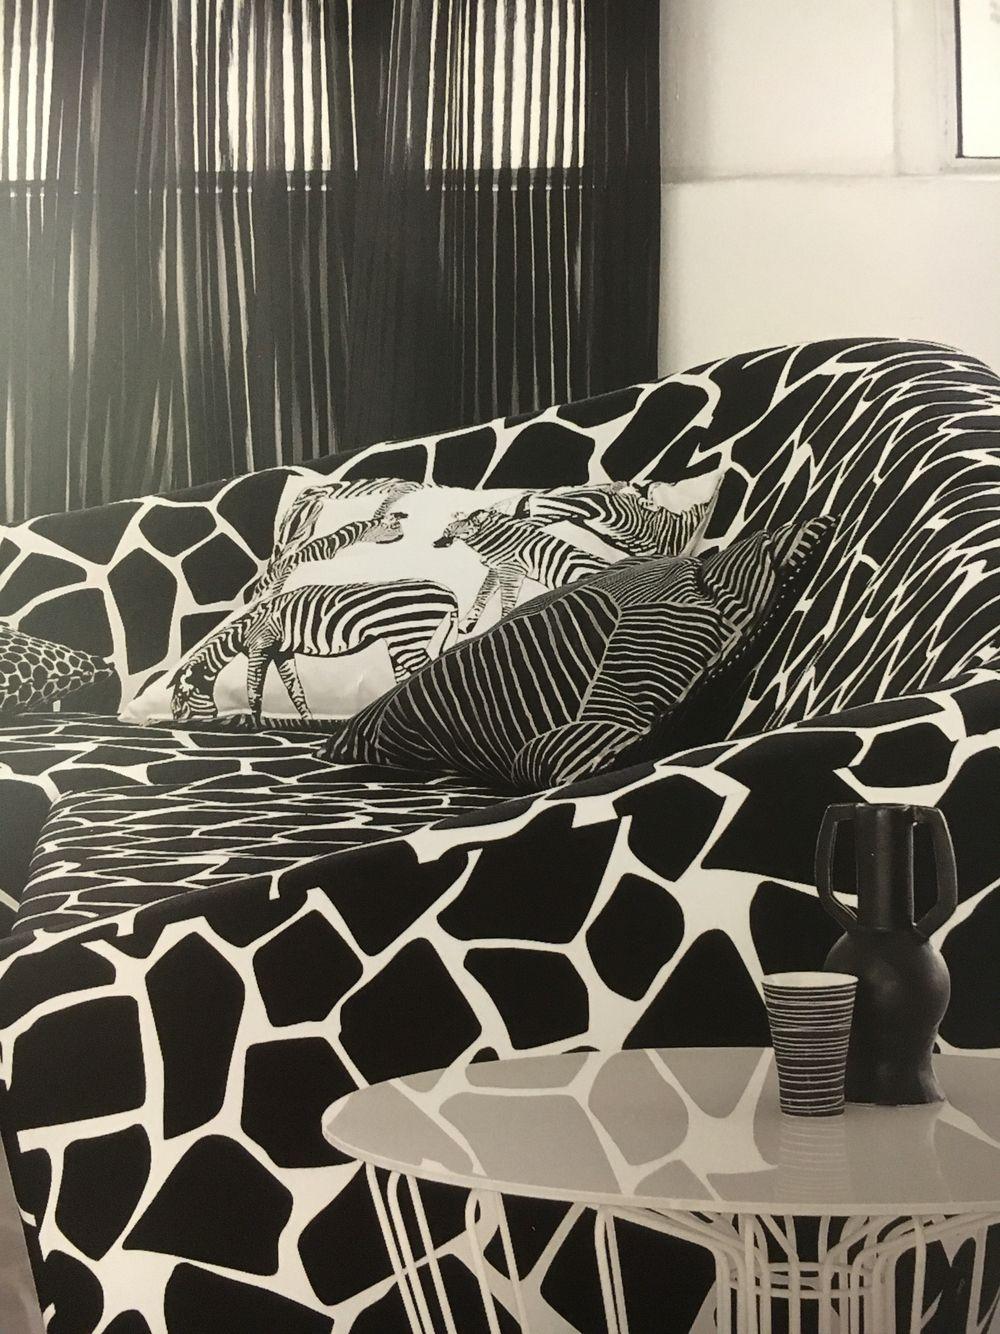 Raumausstatter gardinen dekorationen  Foto: JAB Anstoetz aus Kollektion Yin&Yang! Zebra Stoff MILO 140cm ...